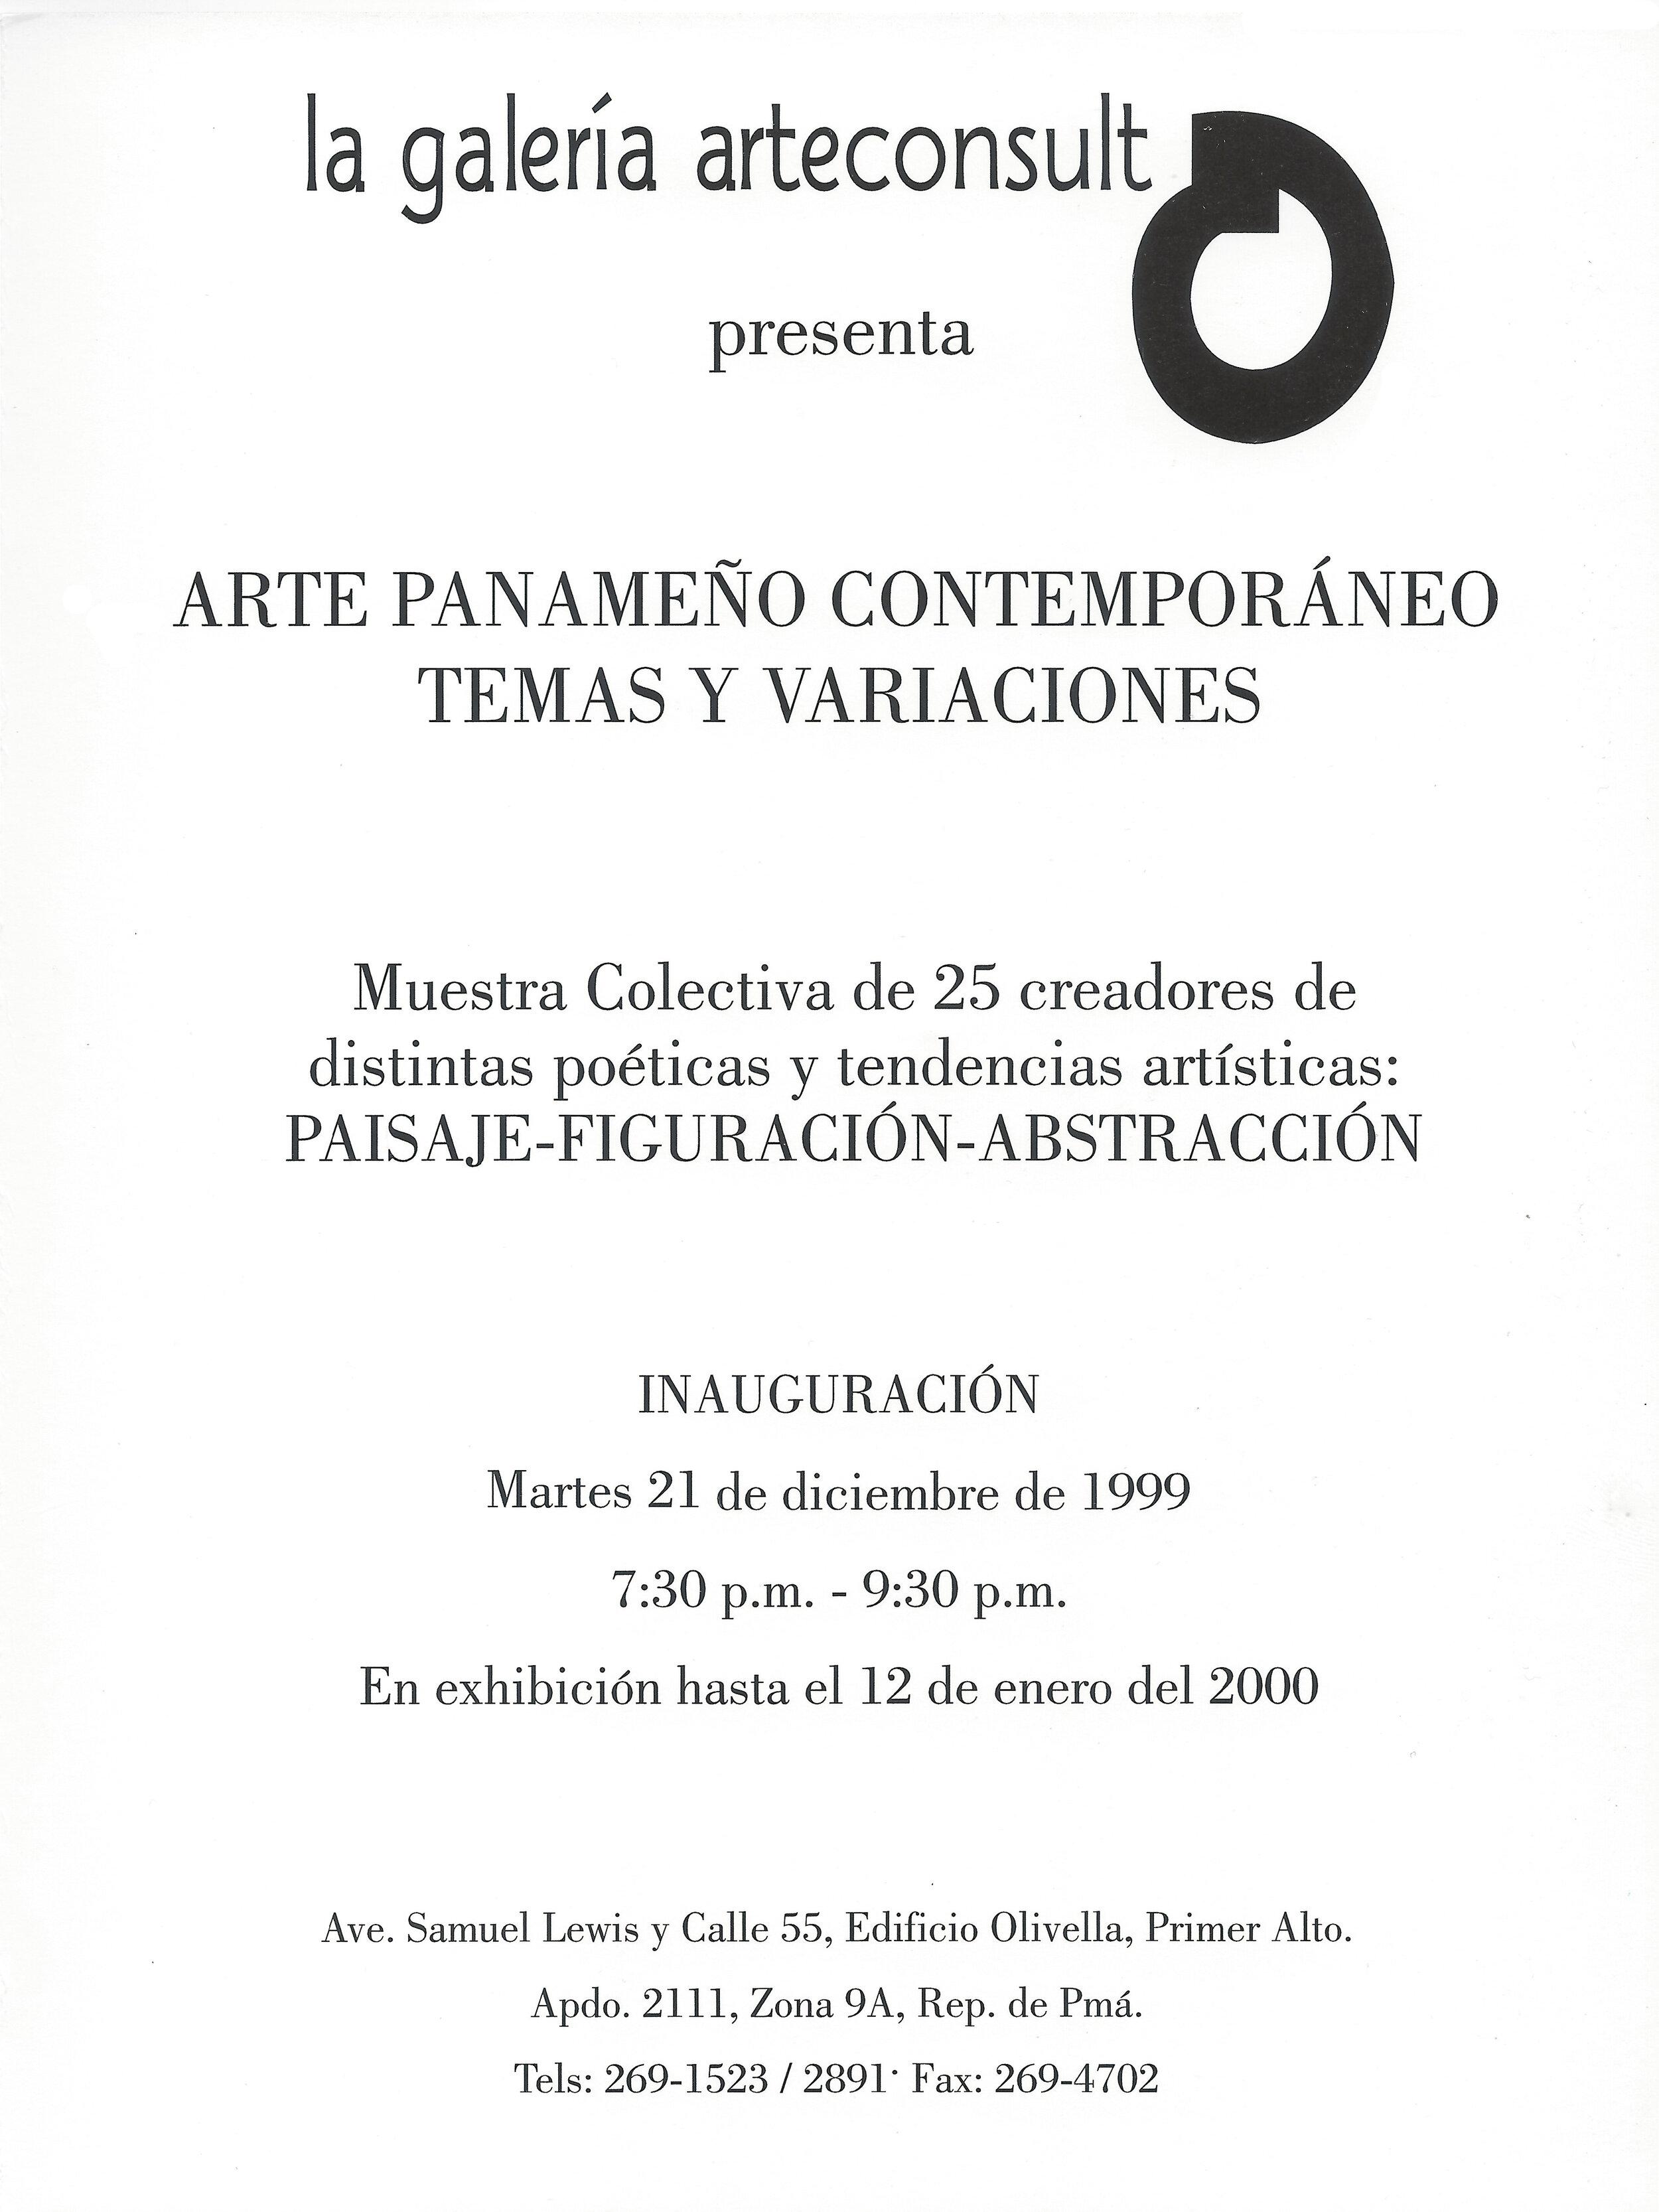 Icaza-1999-PaisajeFiguracionAbstraccion 2.jpg